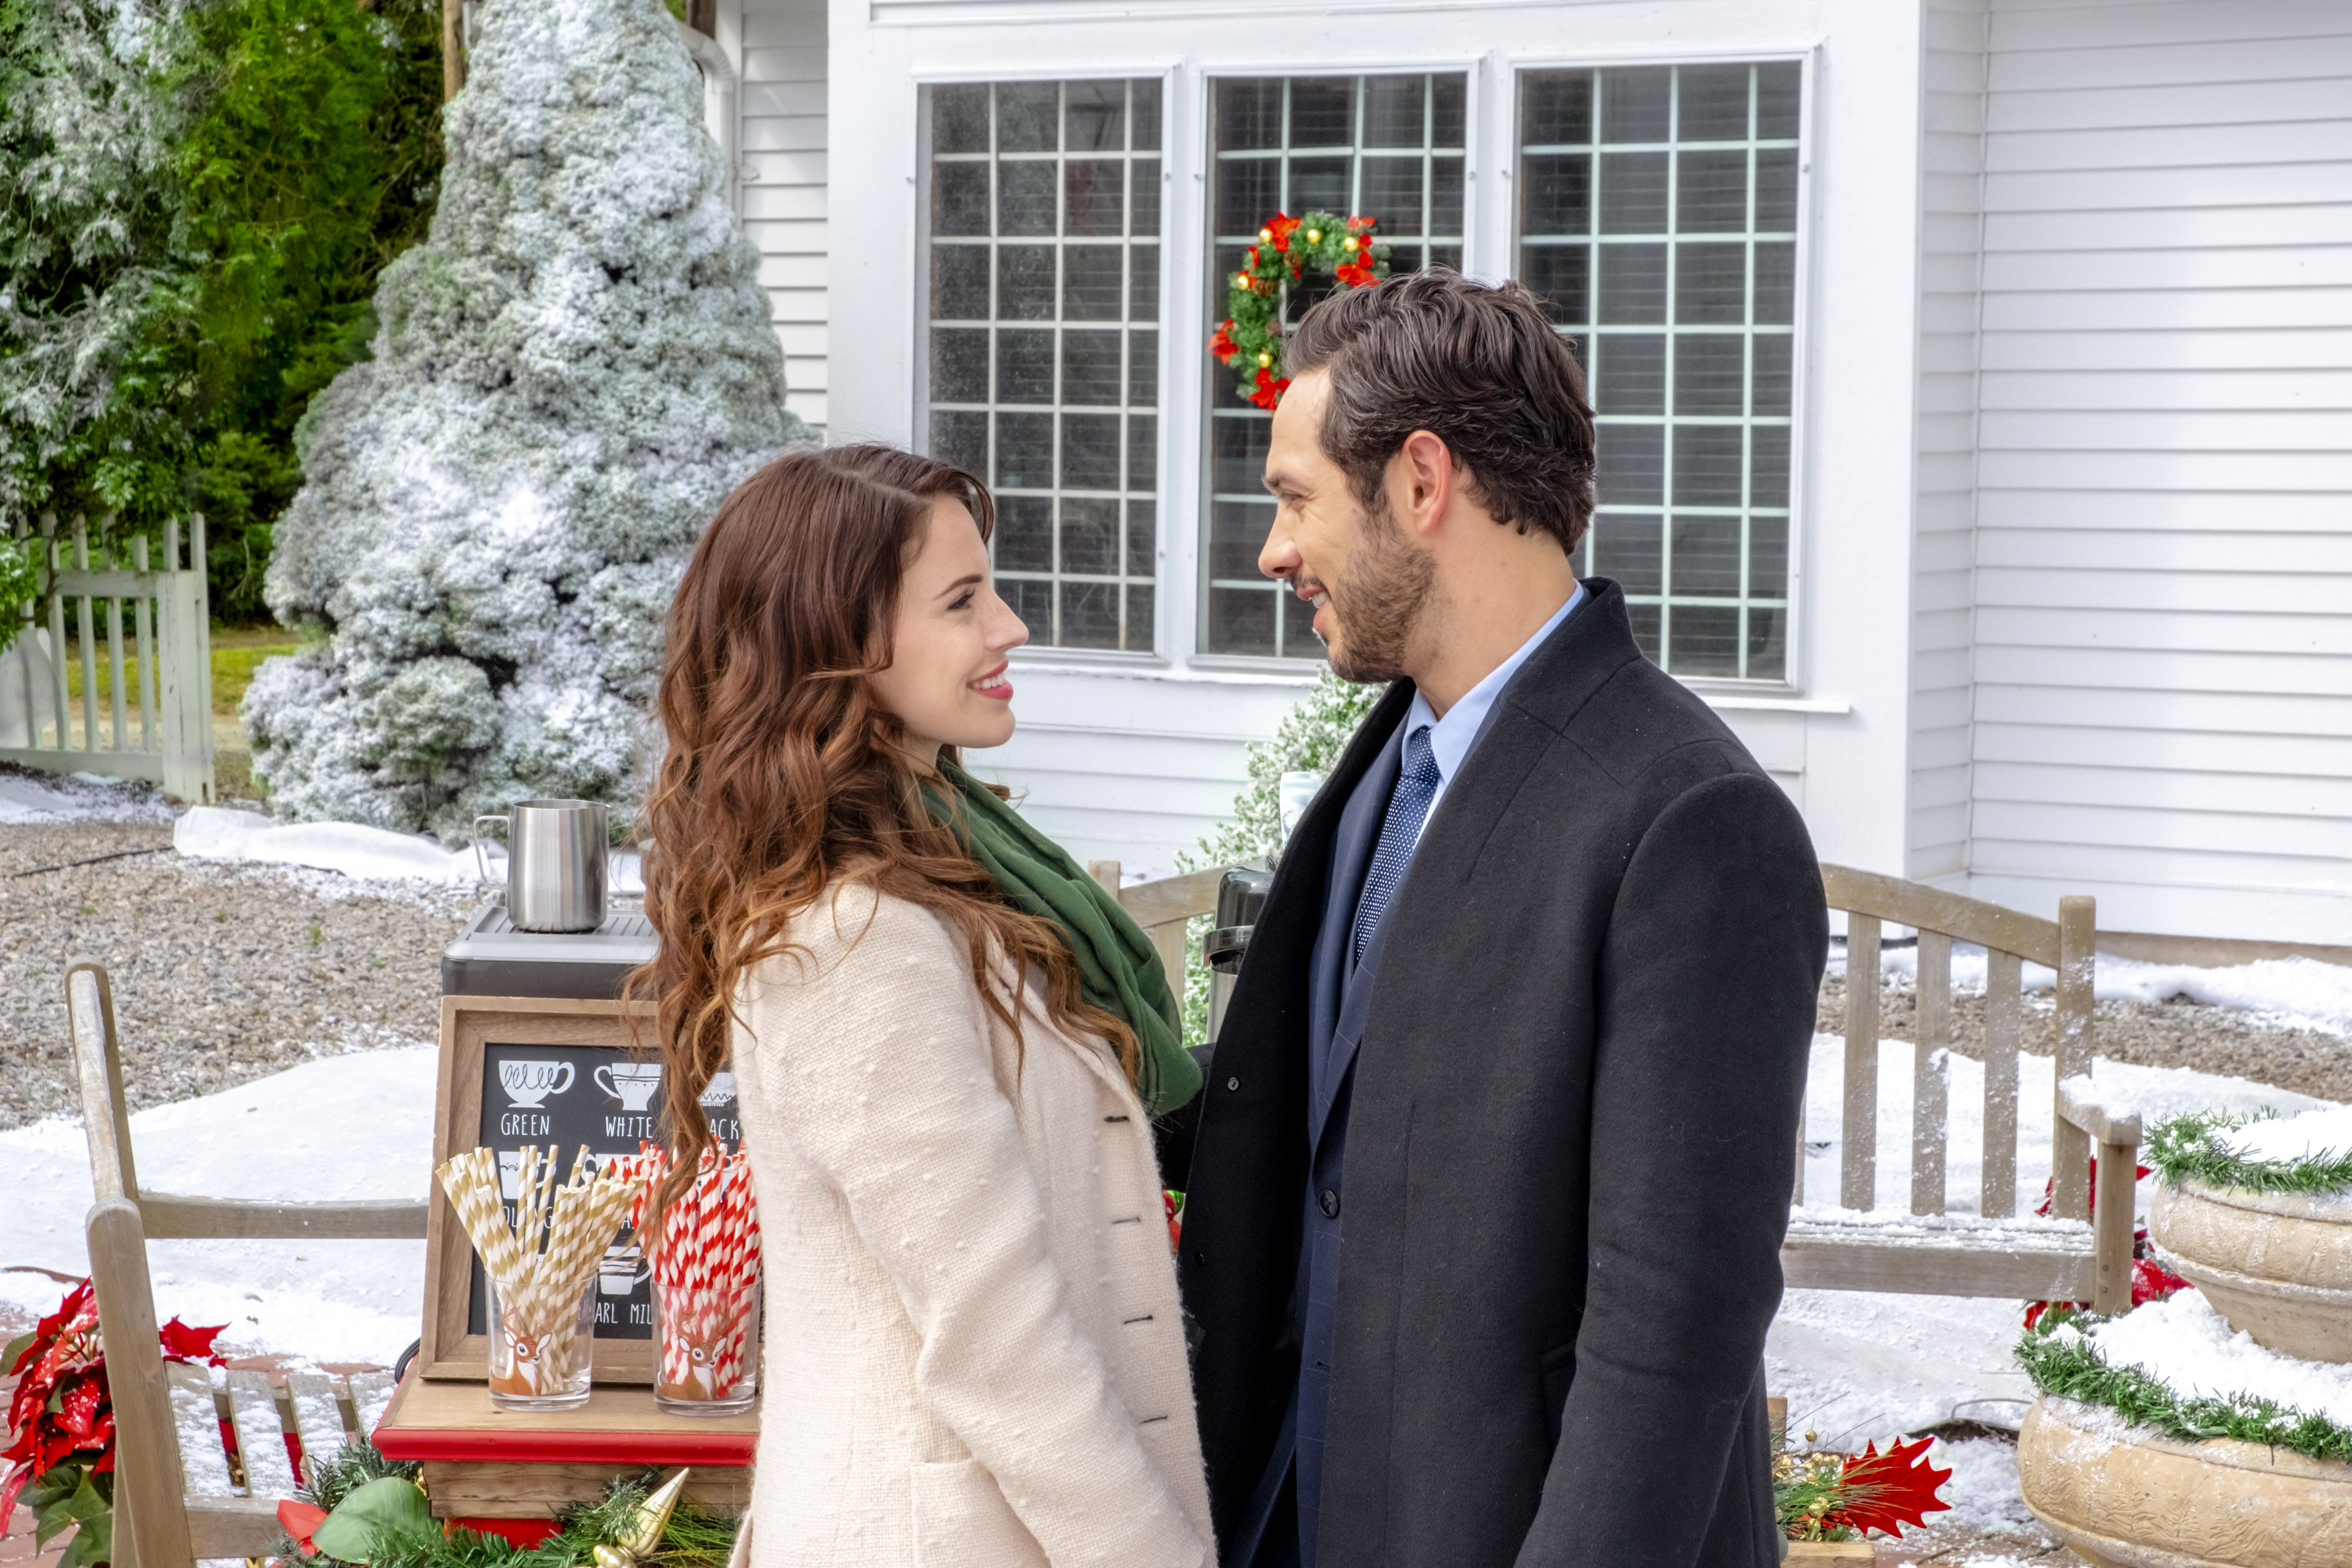 55 New Christmas TV Movies 2018 - Hallmark, Lifetime, Freeform ...